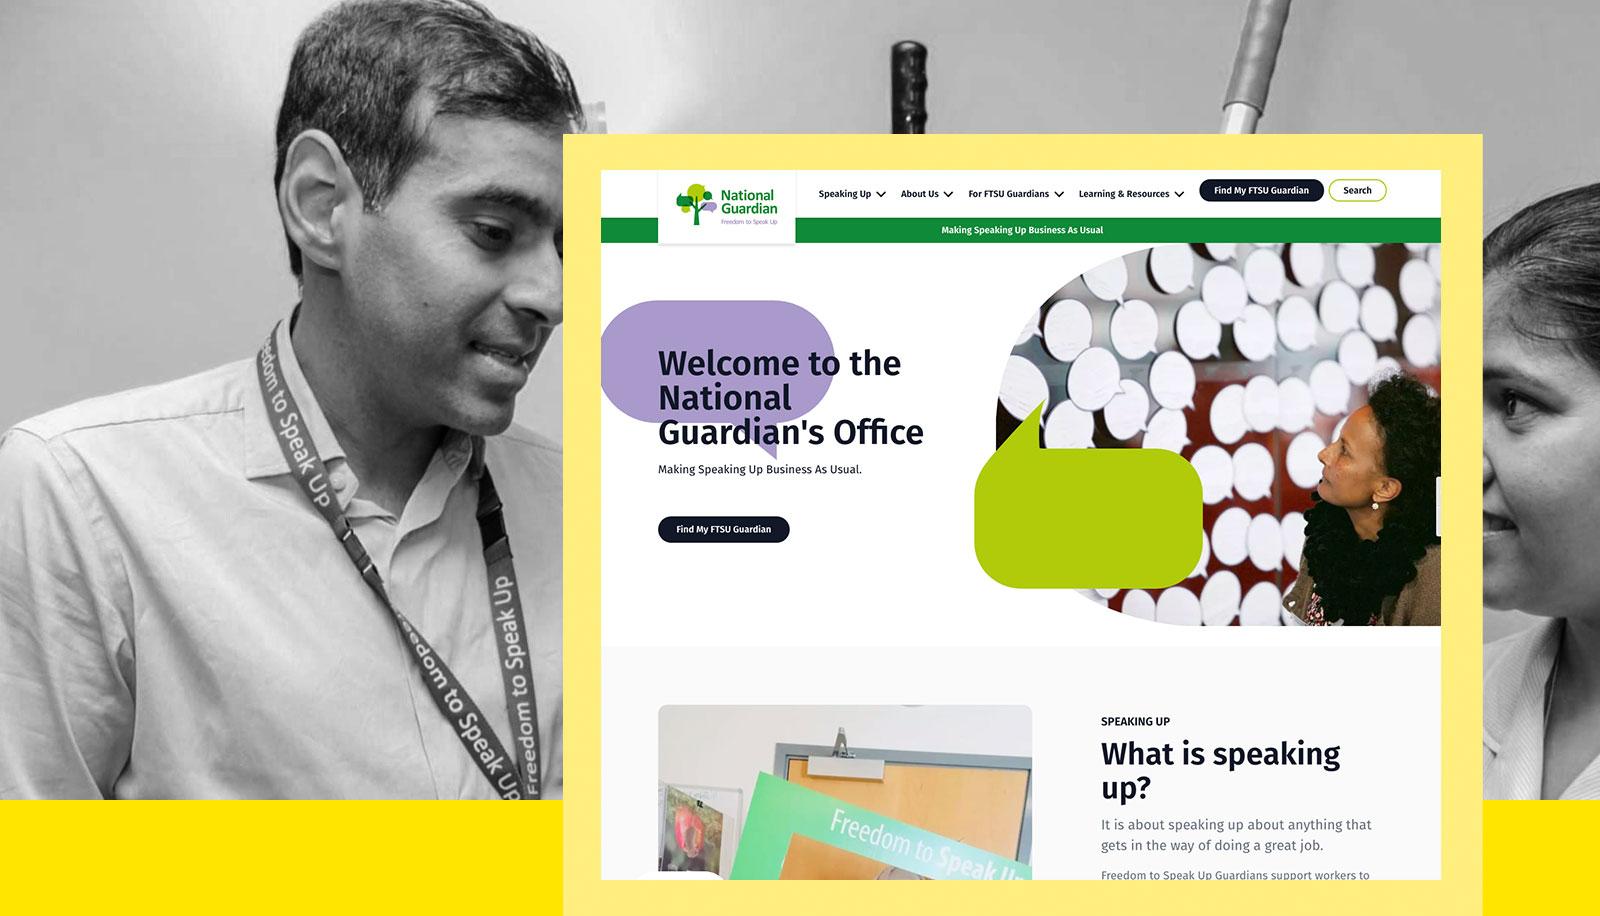 Screenshot of the National Guardian's Office Website